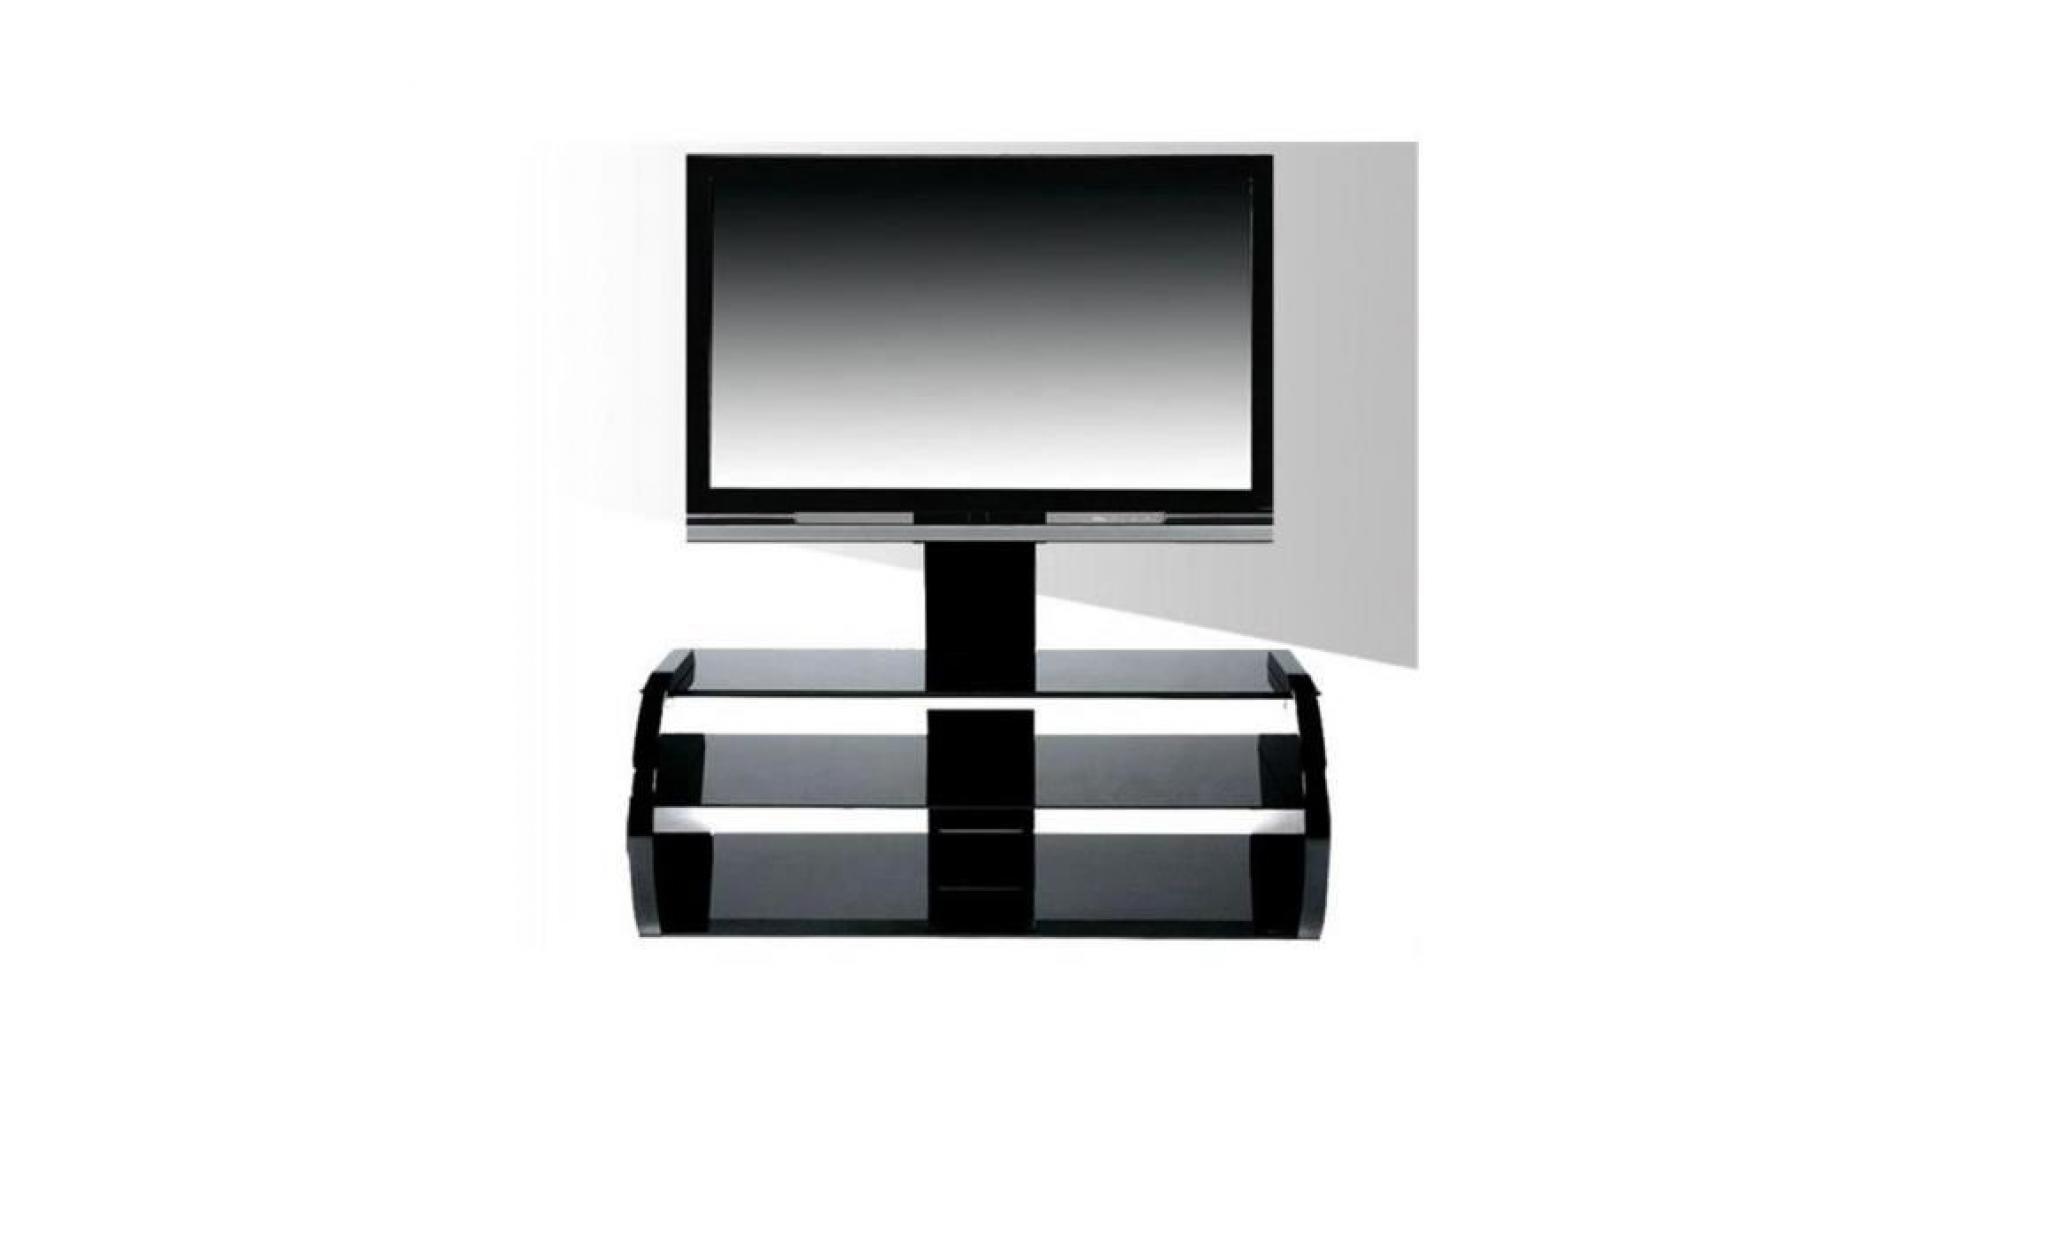 Neostyle Meuble Support Tv 3 Plateaux Noir Nc14 1100